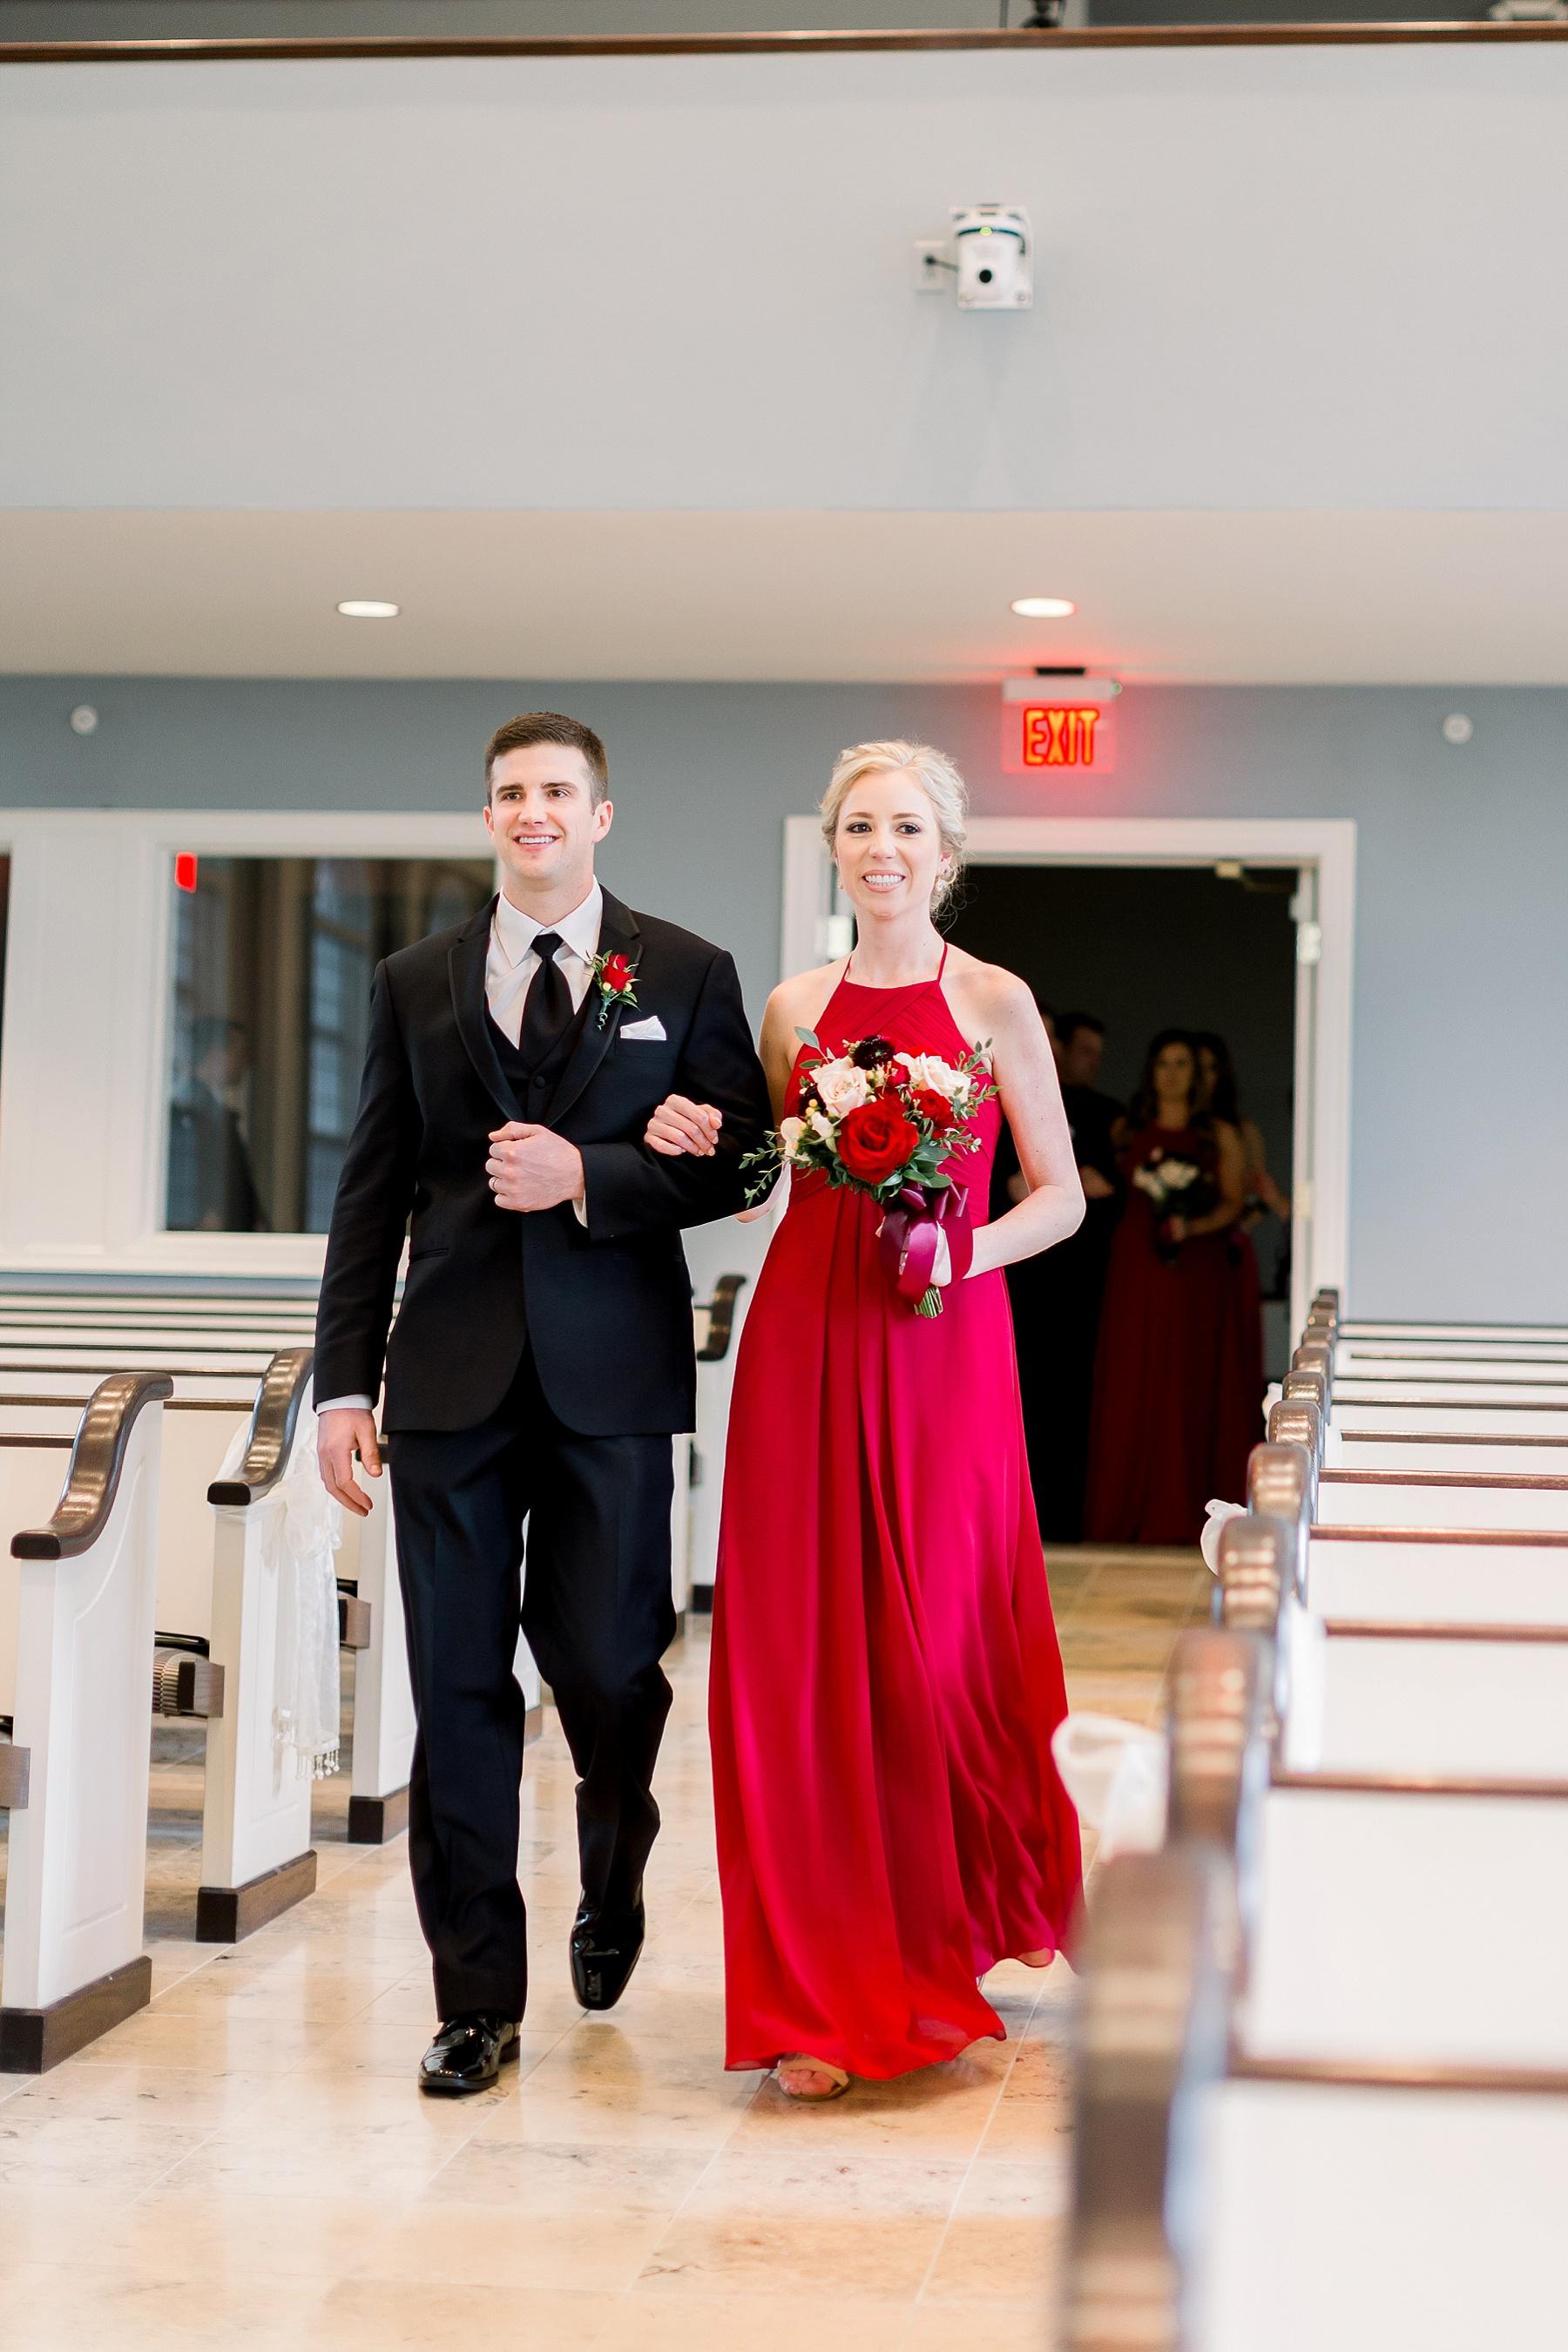 midwest-adventurous-wedding-photographer-elizabeth-ladean-photography-photo_4747.jpg